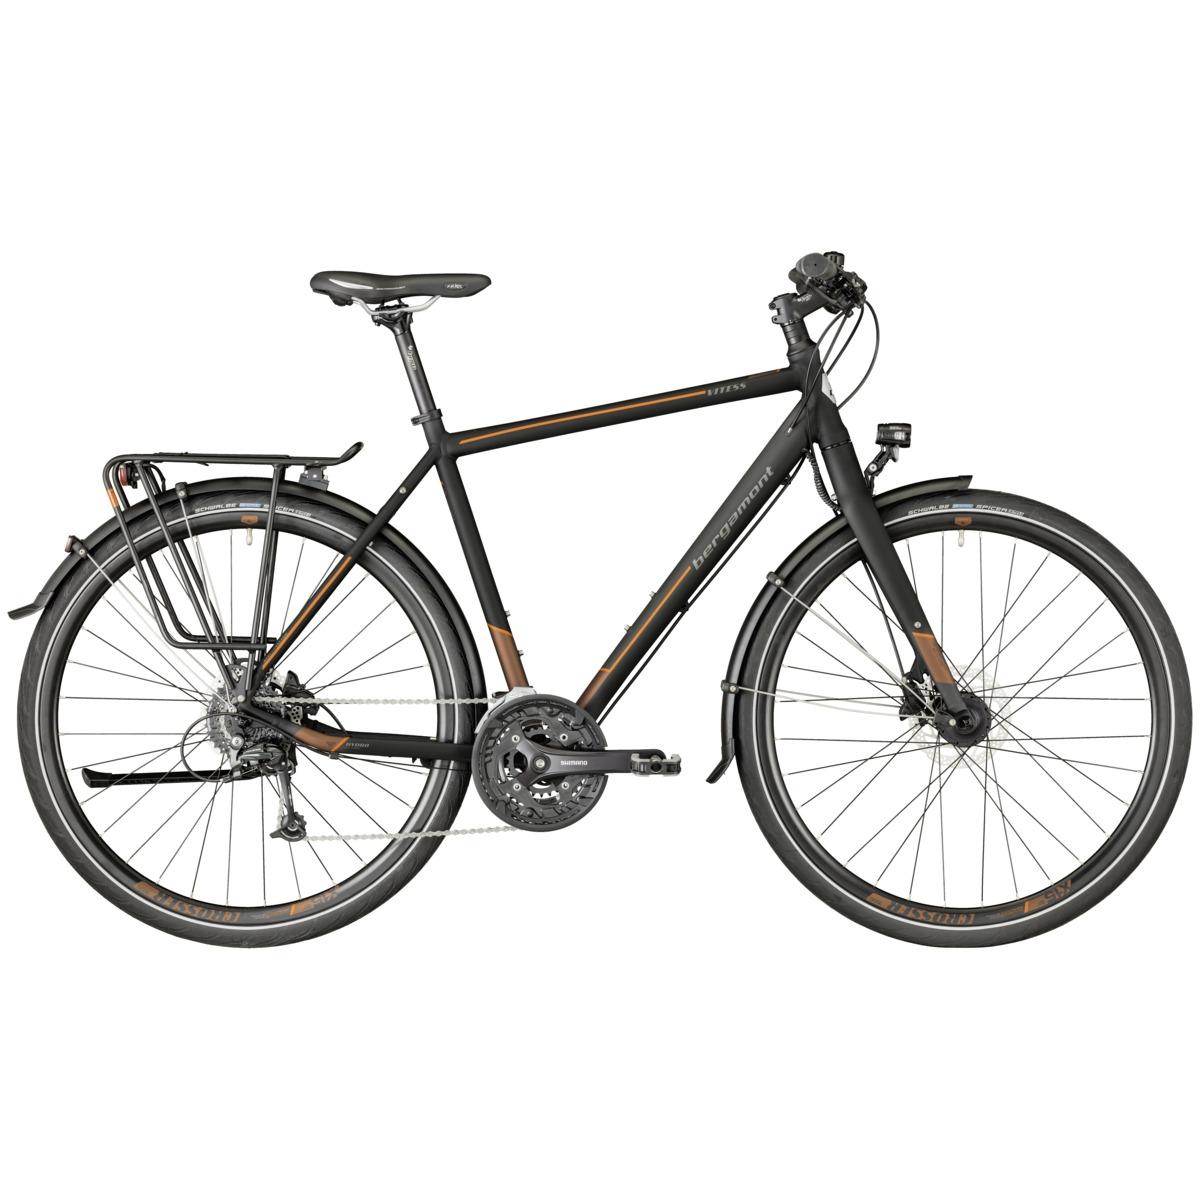 bergamont vitess 6 0 herren trekking fahrrad schwarz braun. Black Bedroom Furniture Sets. Home Design Ideas